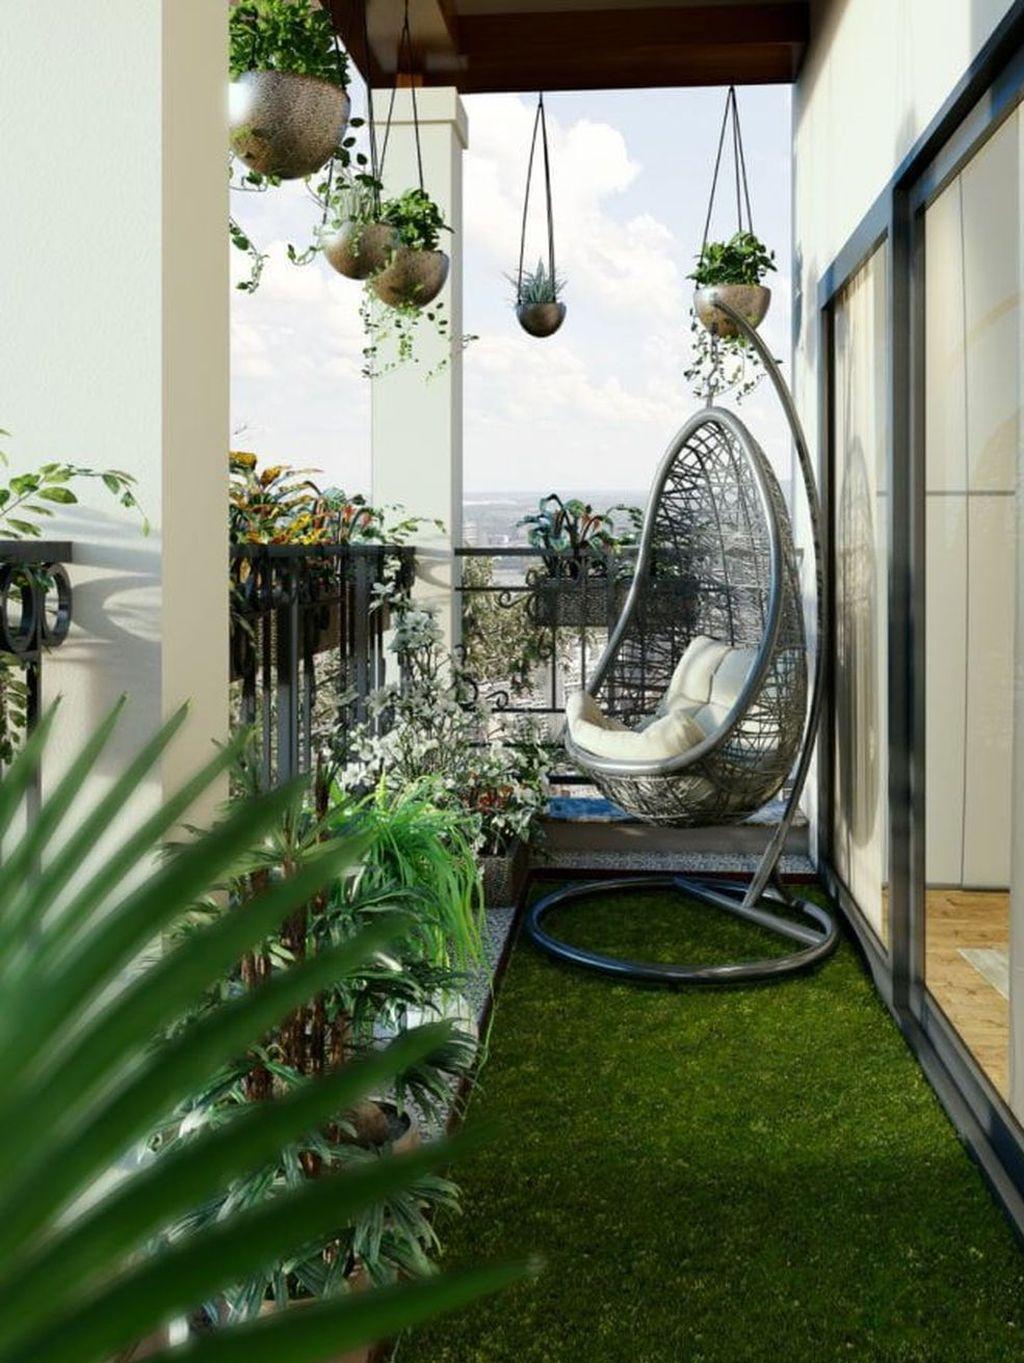 33 The Best Apartment Balcony Design Ideas - MAGZHOUSE